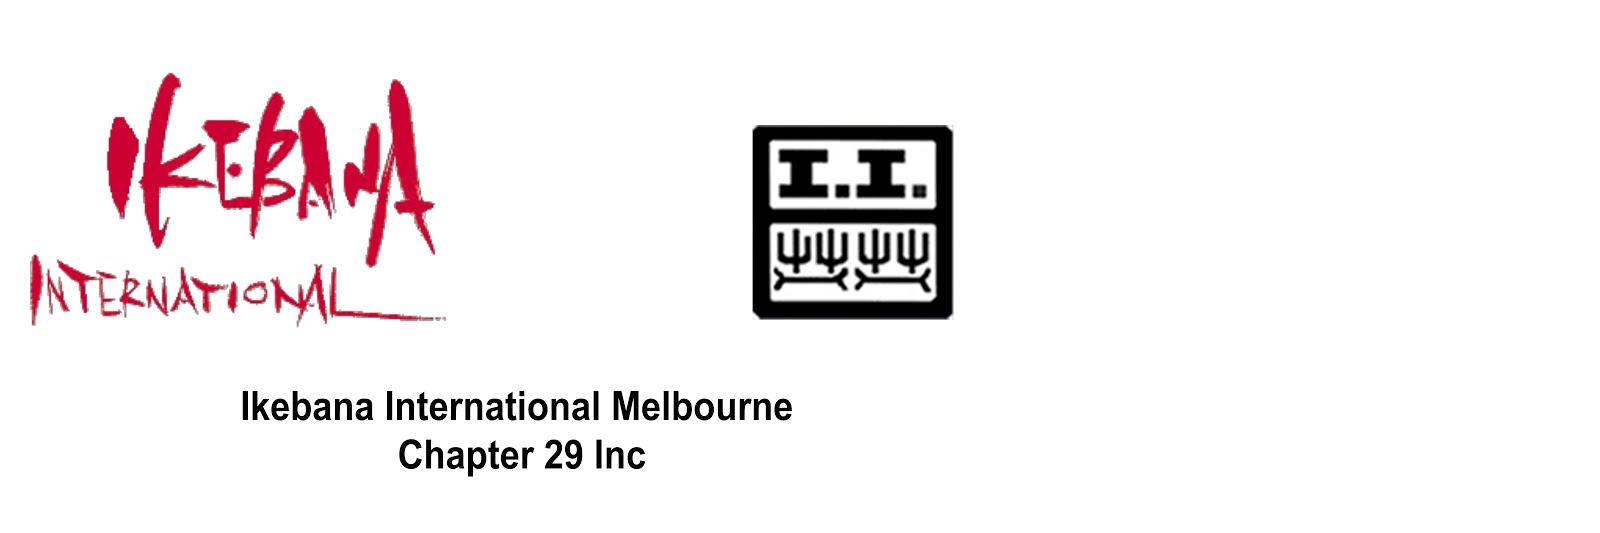 Ikebana Melbourne